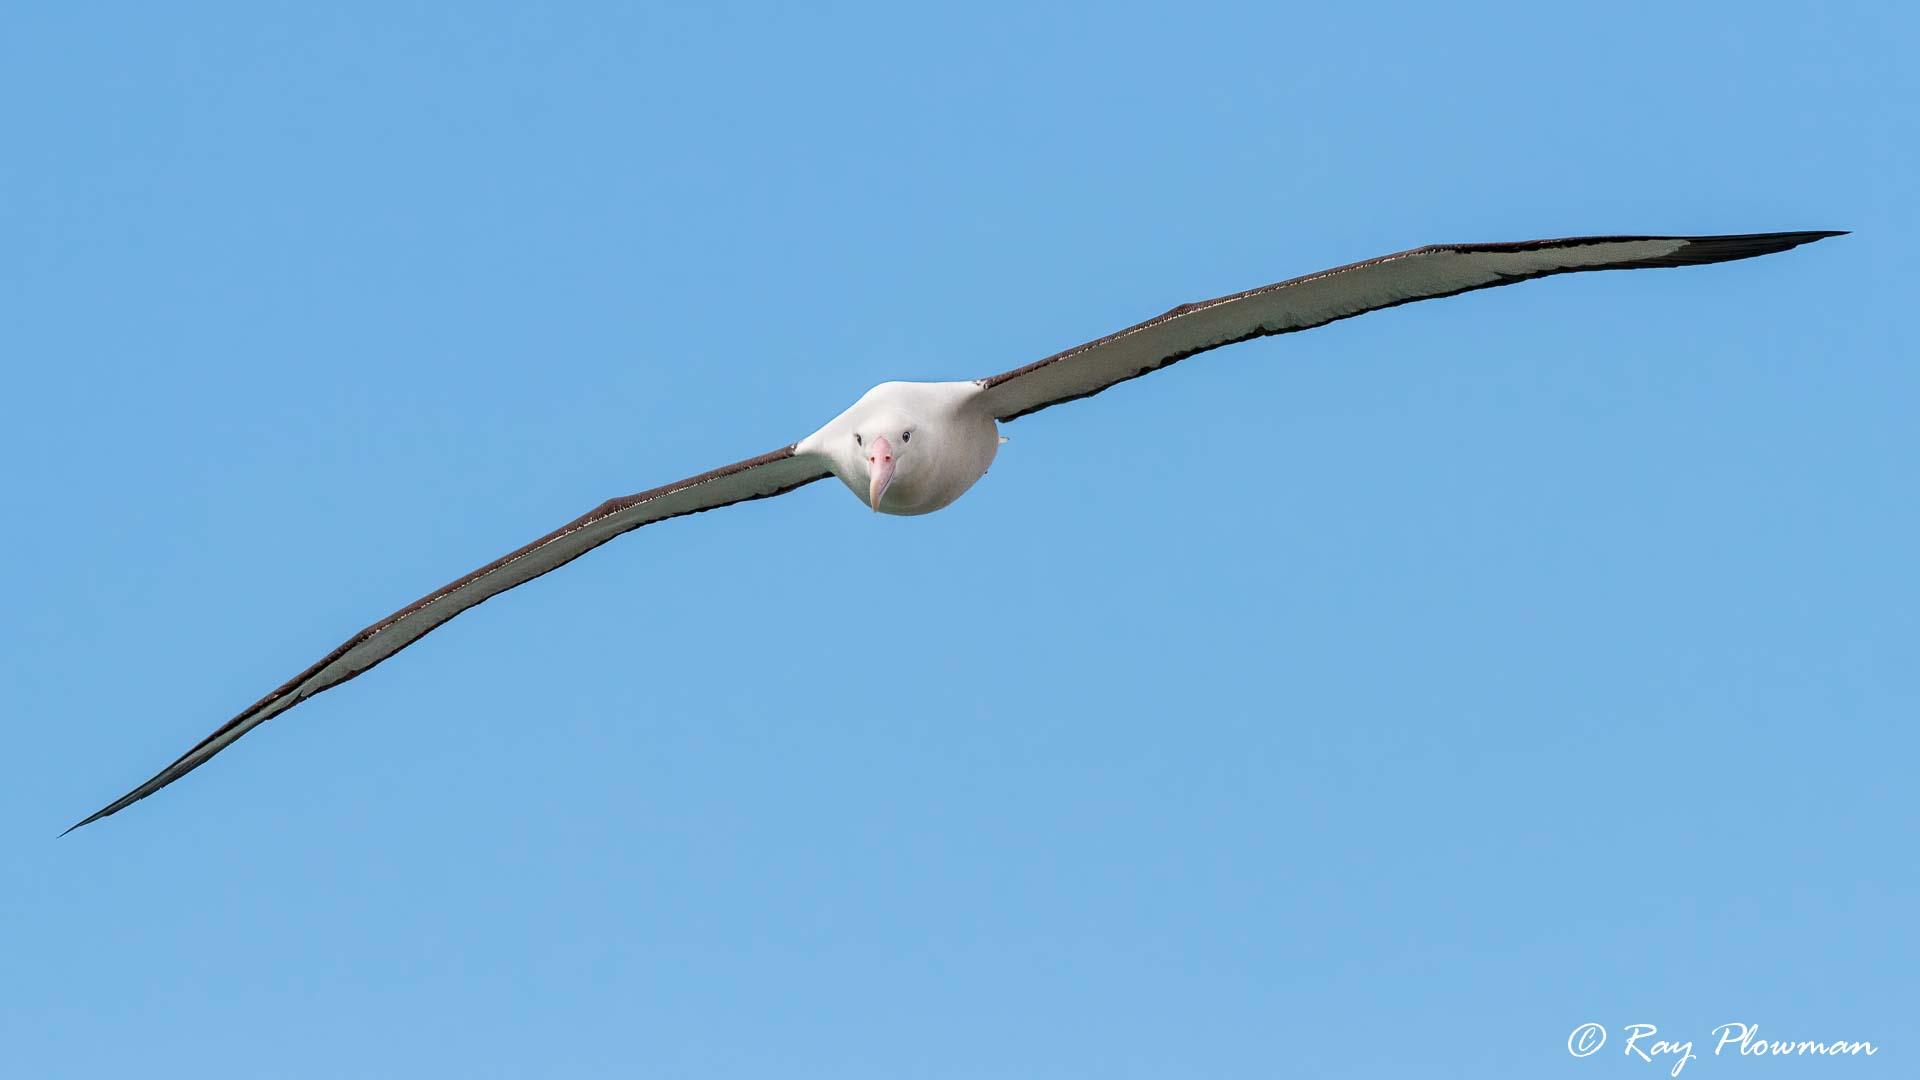 Northern Royal Albatross (Diomedea sanfordi) gliding at Taiaroa Head on the Otago Peninsula